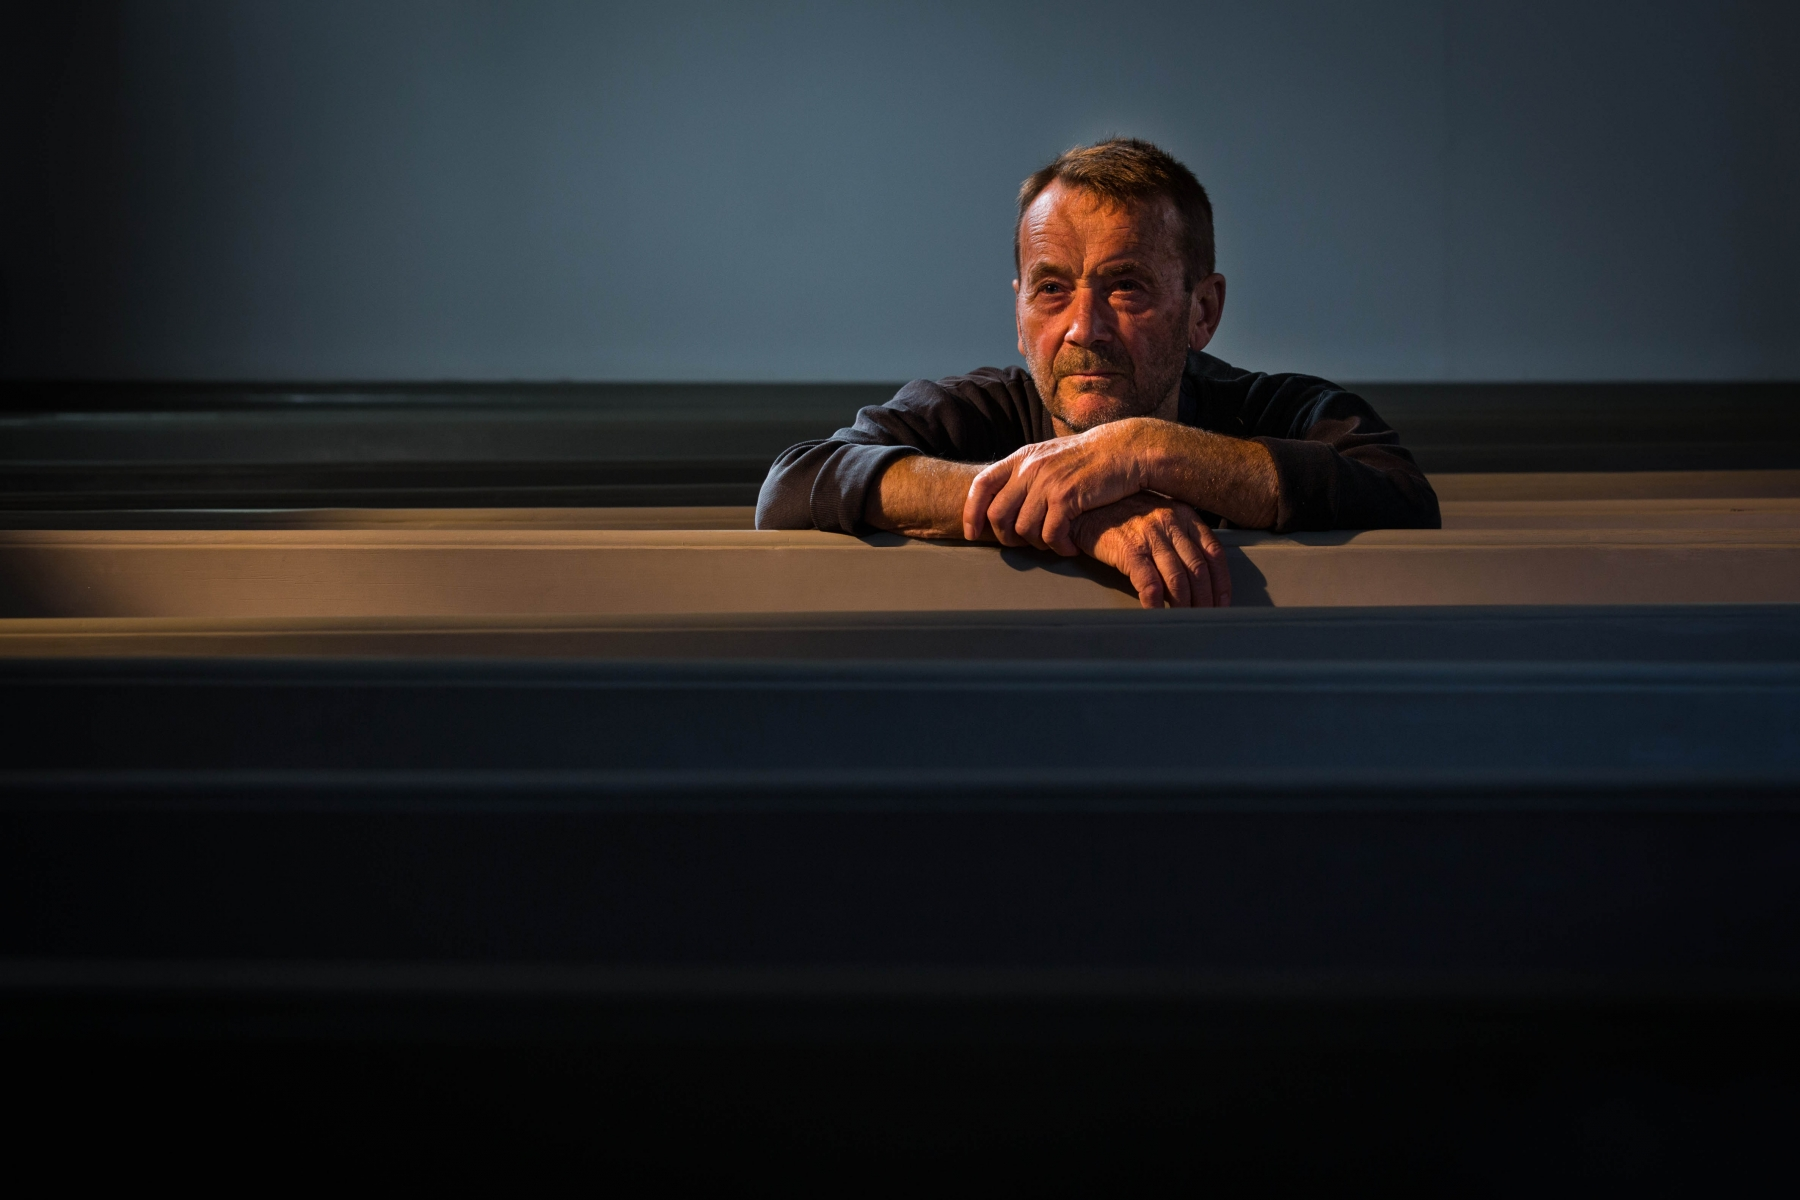 © Steffen Jensen | Kunstner kirketjener ulandsaktivist og meget andet Hans Kjær i Rudkøbing Kirke.